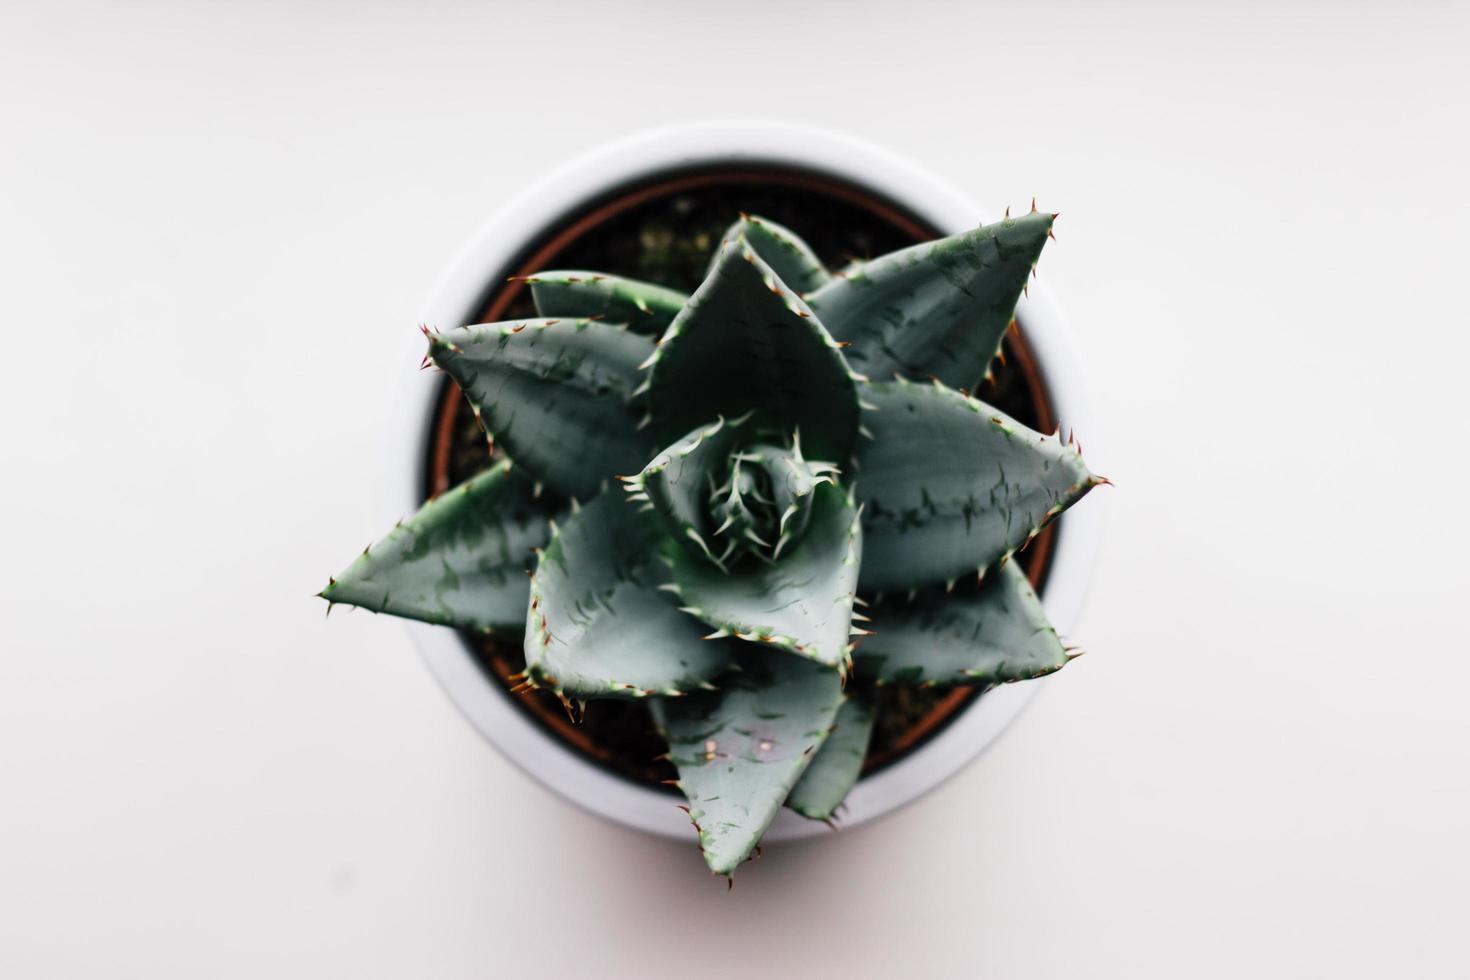 grön kaktus på vit bakgrund foto